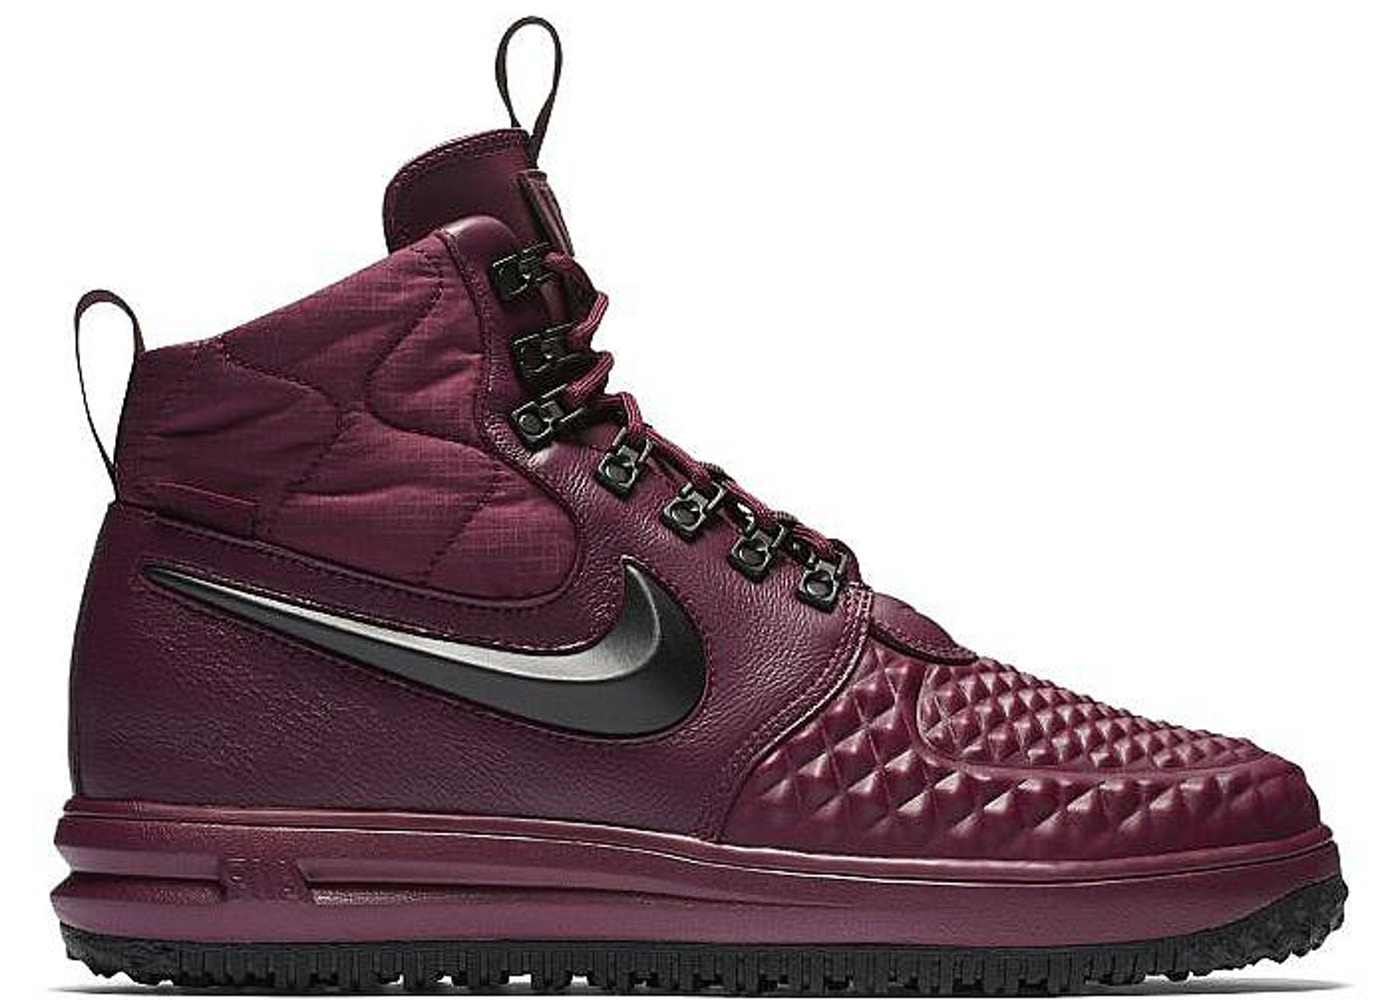 sneakers for cheap b1a4c cc005 Nike Lf1 Duckboot 17 BordeauxBlack